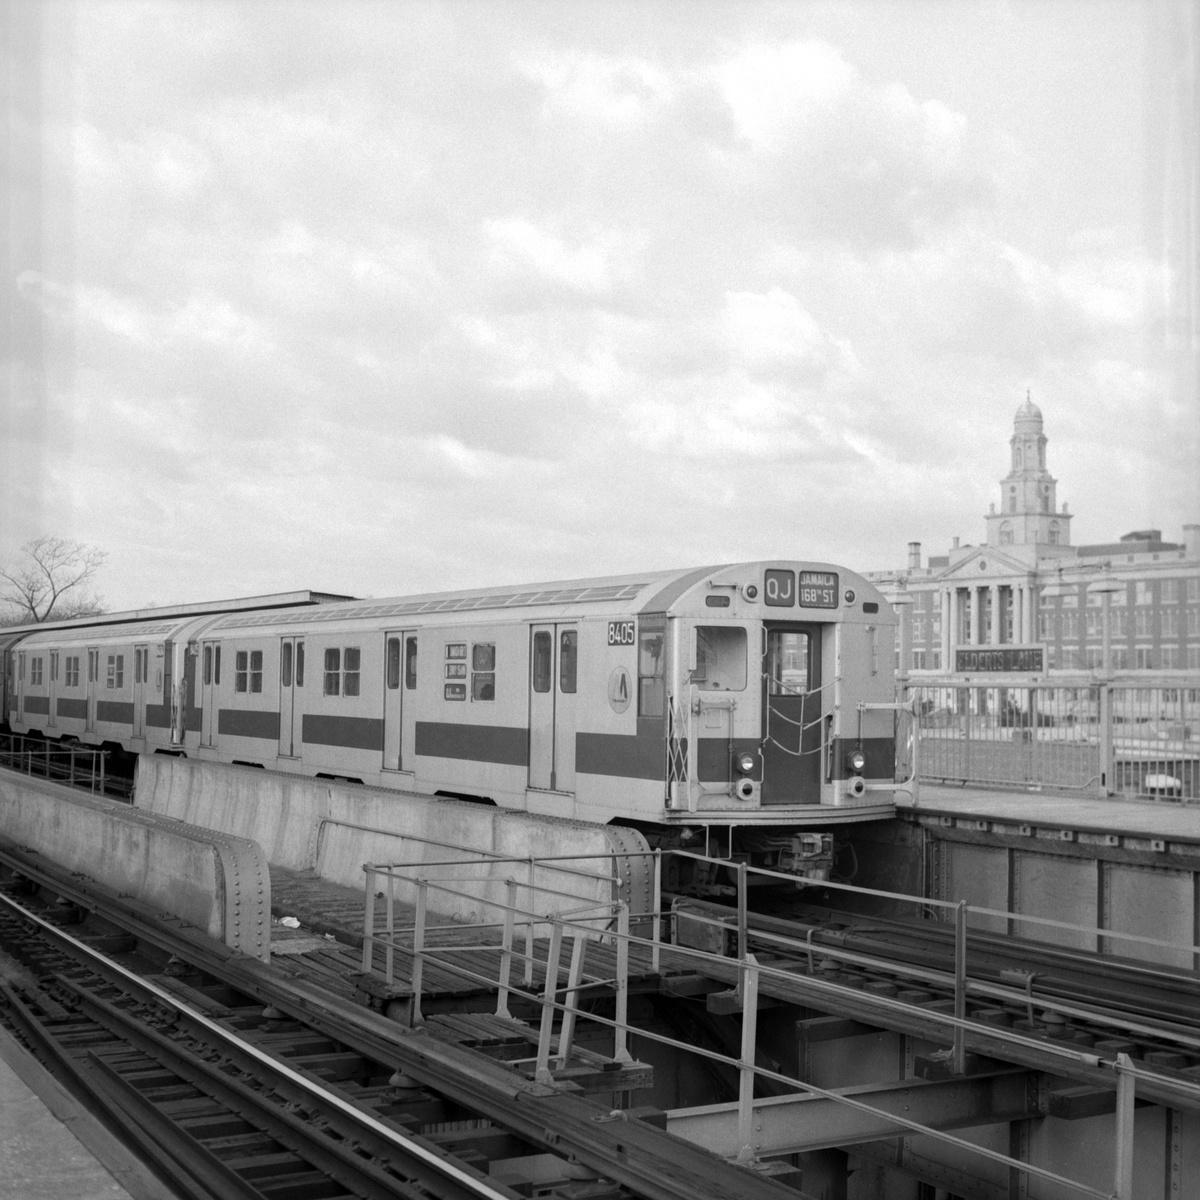 (176k, 1024x762)<br><b>Country:</b> United States<br><b>City:</b> New York<br><b>System:</b> New York City Transit<br><b>Line:</b> BMT Nassau Street/Jamaica Line<br><b>Location:</b> 75th Street/Elderts Lane <br><b>Route:</b> QJ<br><b>Car:</b> R-30 (St. Louis, 1961) 8405 <br><b>Collection of:</b> George Conrad Collection<br><b>Date:</b> 11/2/1970<br><b>Viewed (this week/total):</b> 2 / 3282